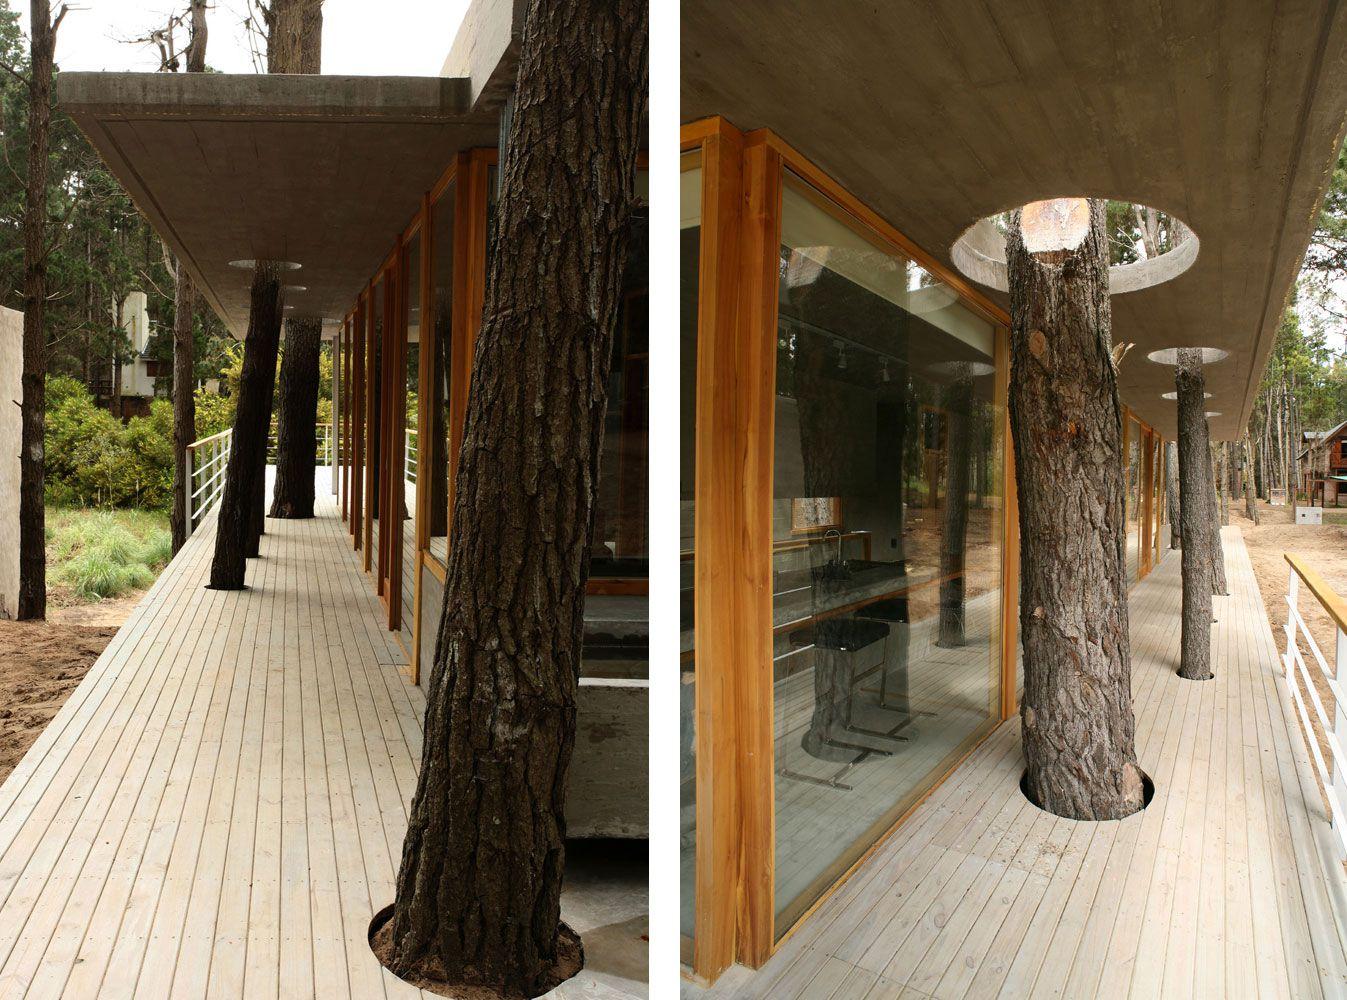 House-Among-Trees-05